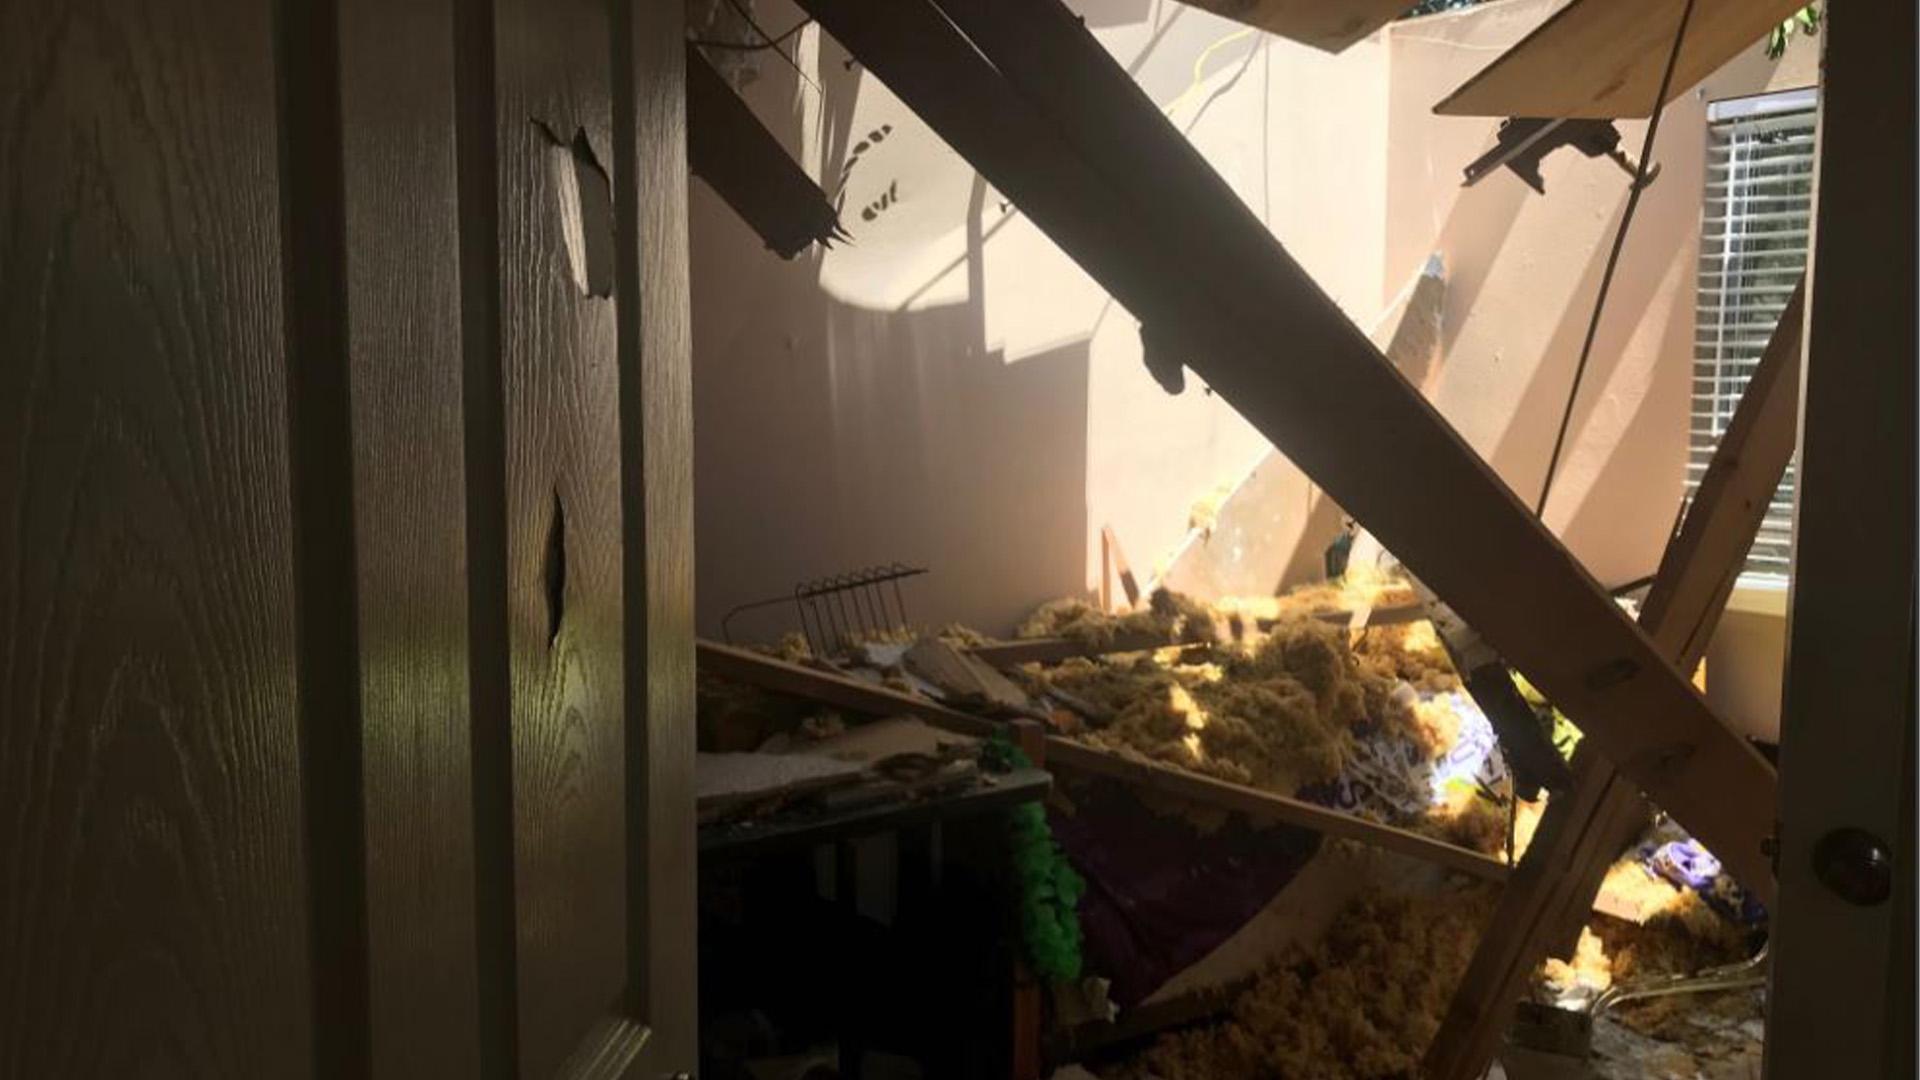 Major cleanup underway in Ascension Parish neighborhood